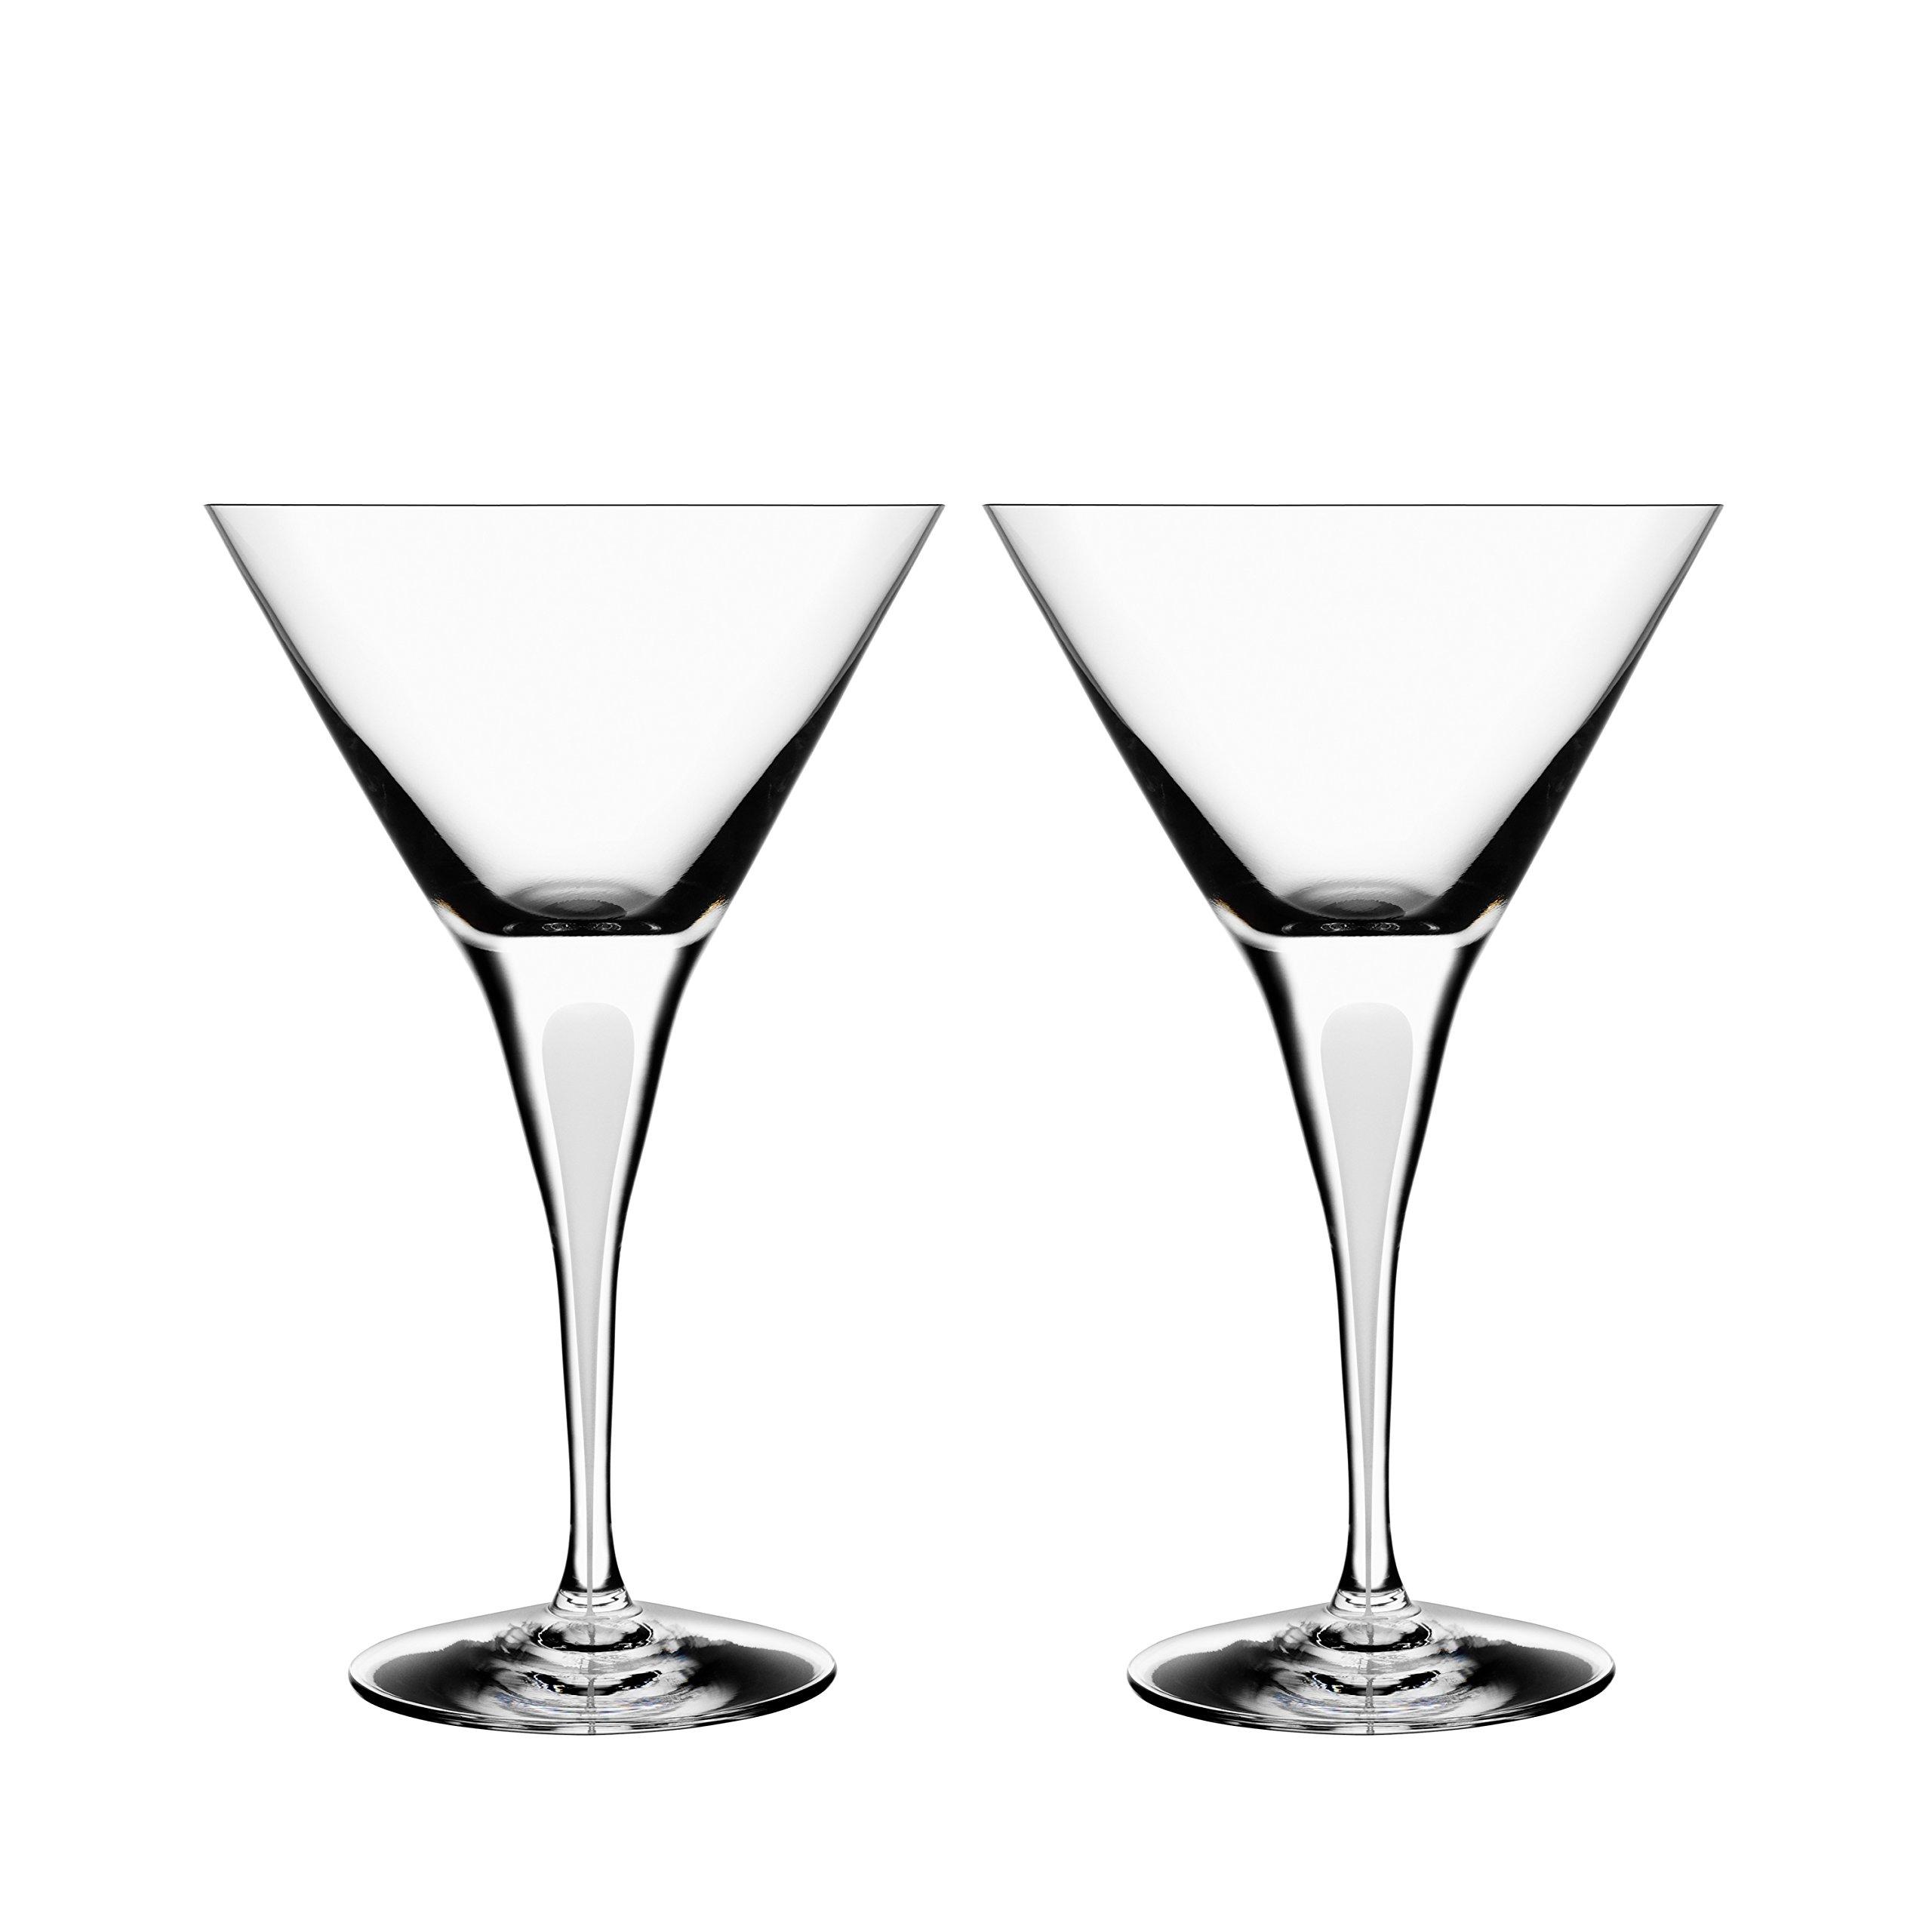 Orrefors Intermezzo Satin 7 Ounce Martini Glass, Set of 2